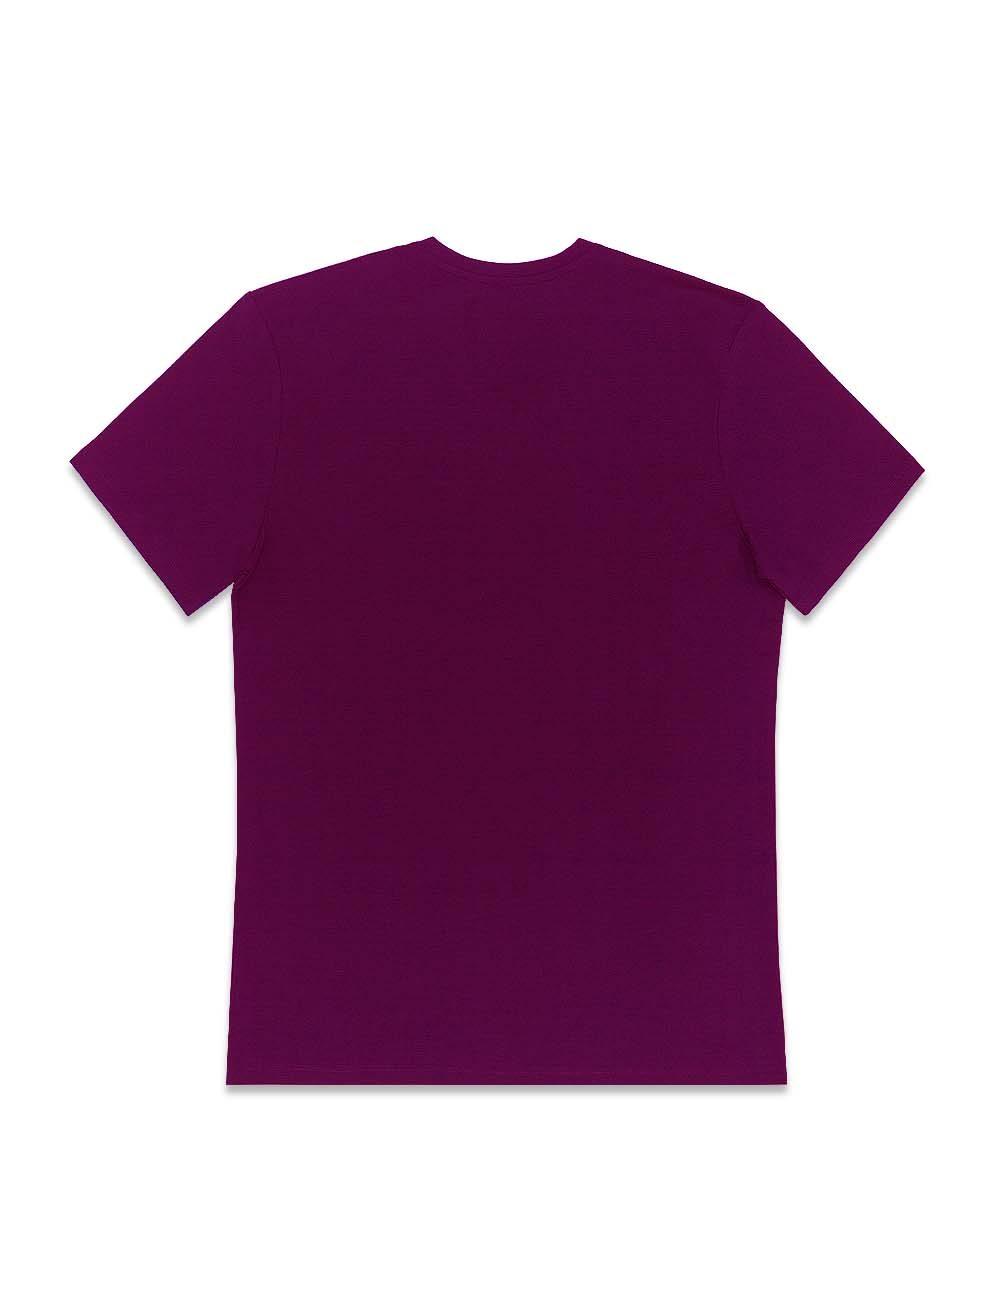 Burgundy Premium Cotton Stretch V Neck Slim Fit T-Shirt – TS3A4.3